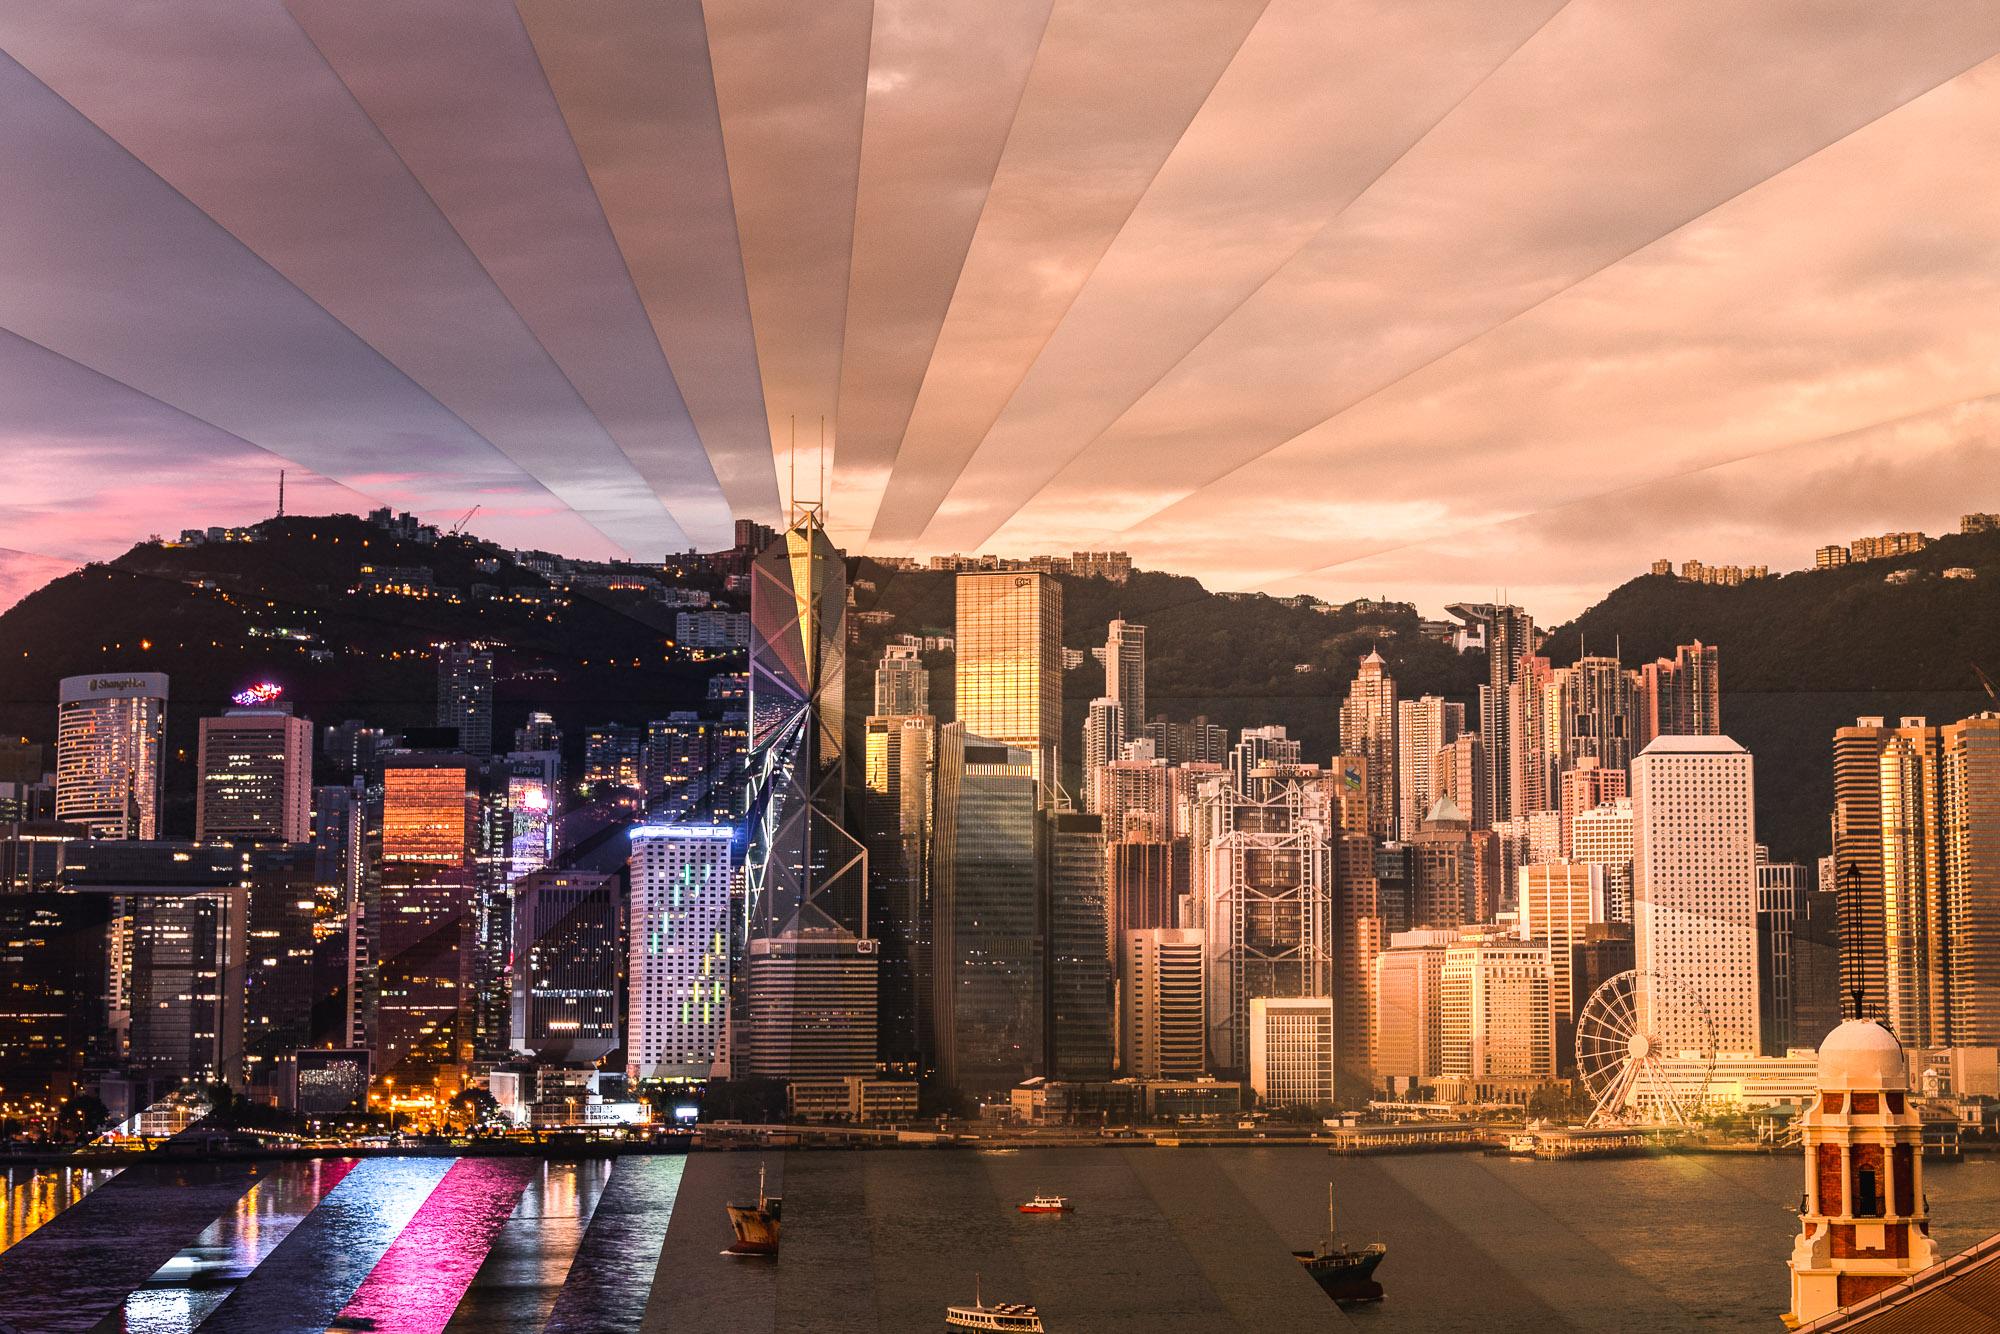 Timeslice Hong Kong in 35 photos